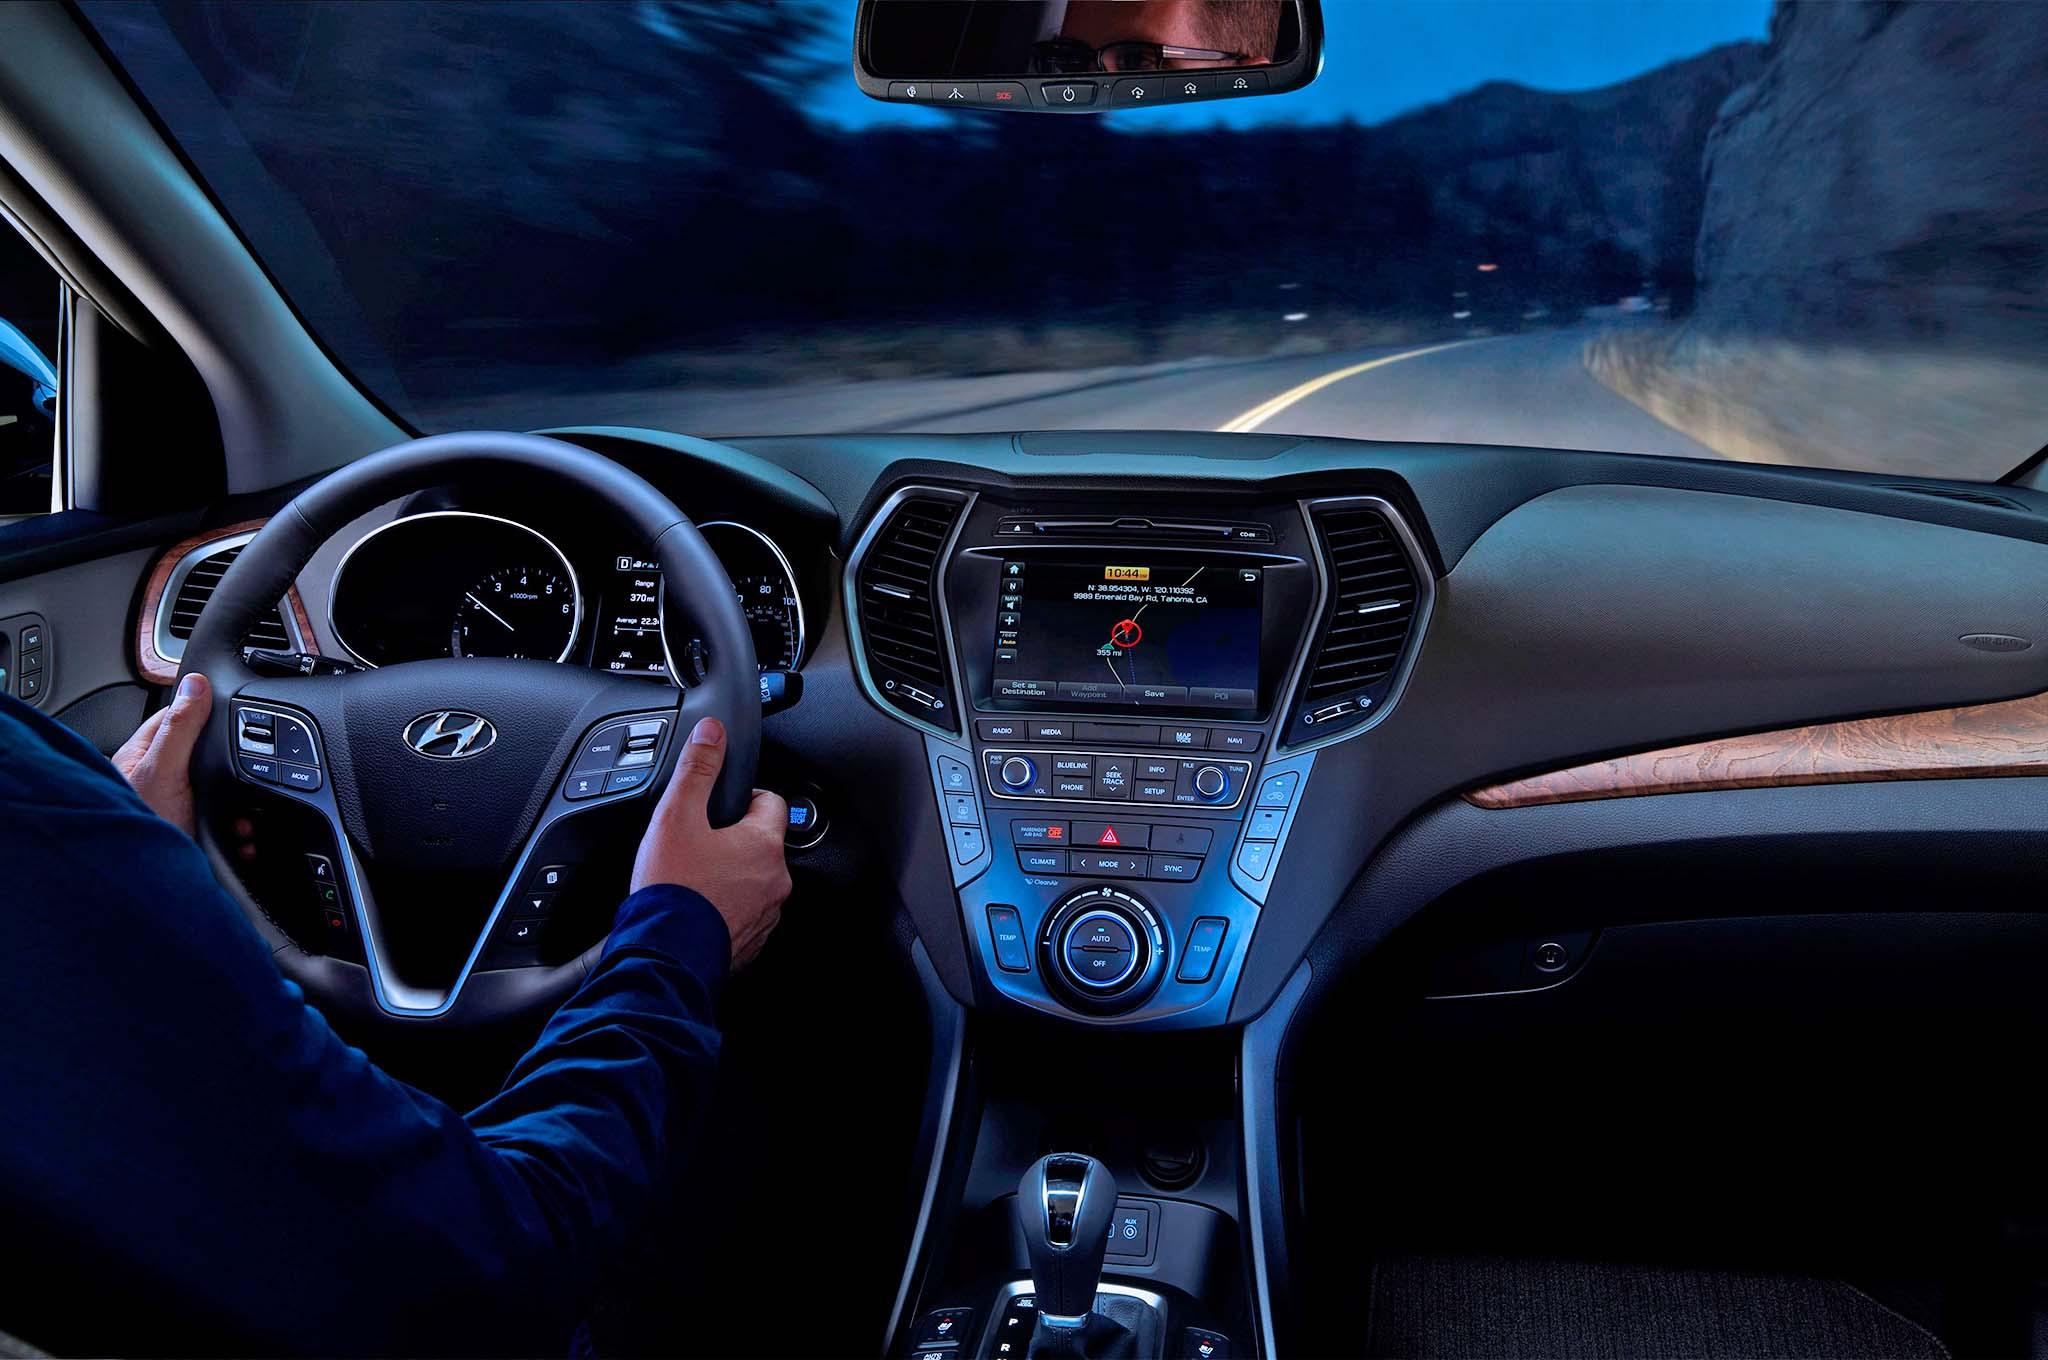 2018 Hyundai Santa Fe Interior View Night Motor Trend En